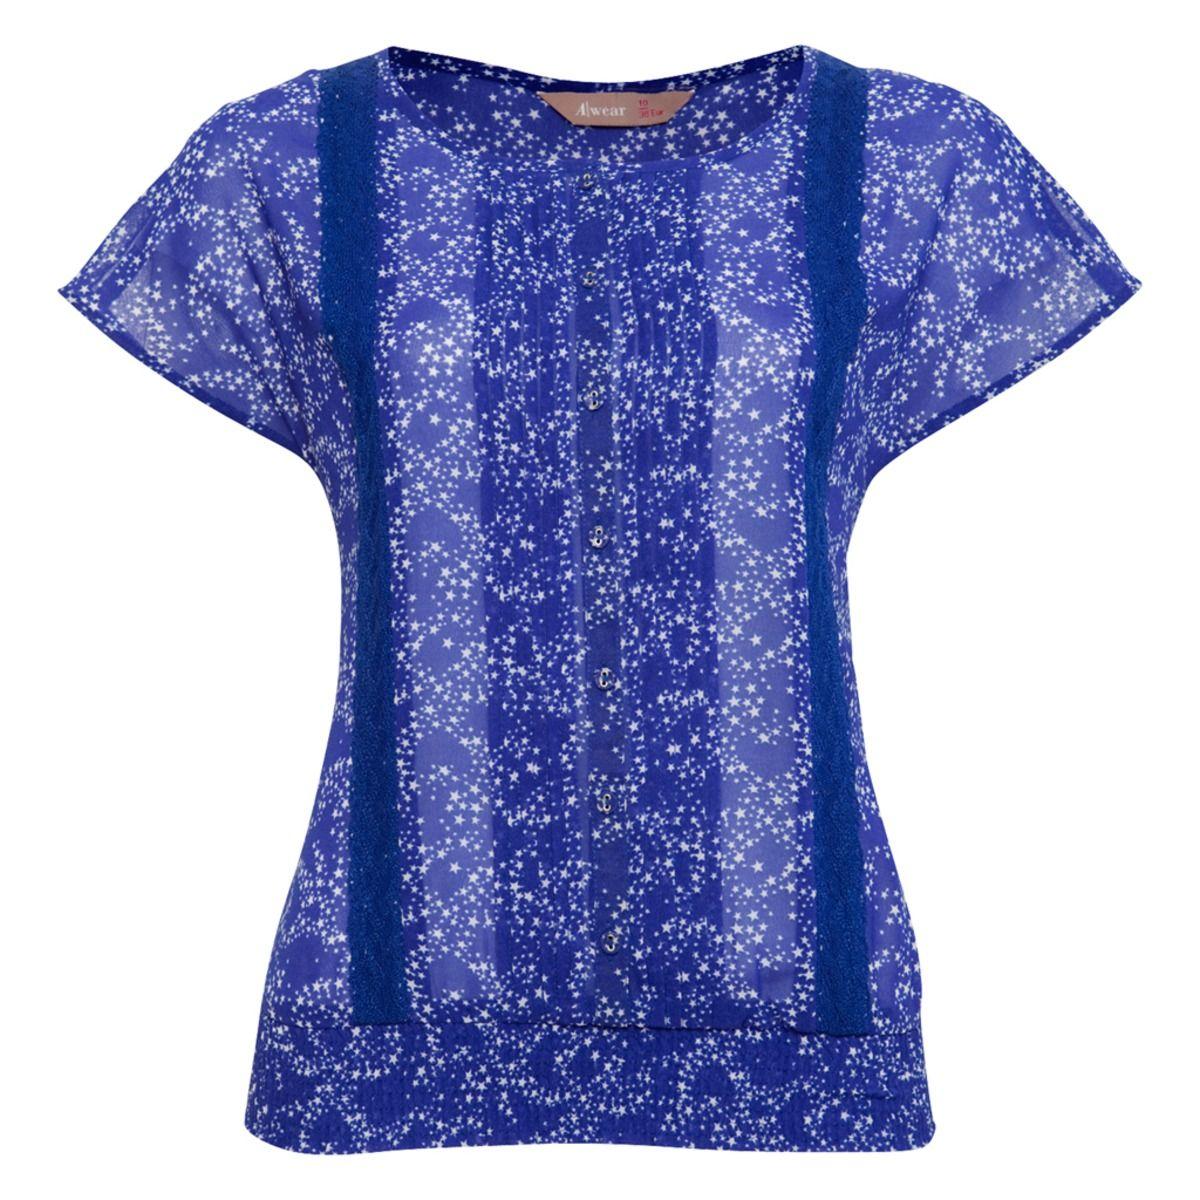 Ciara Star Print Lace Top